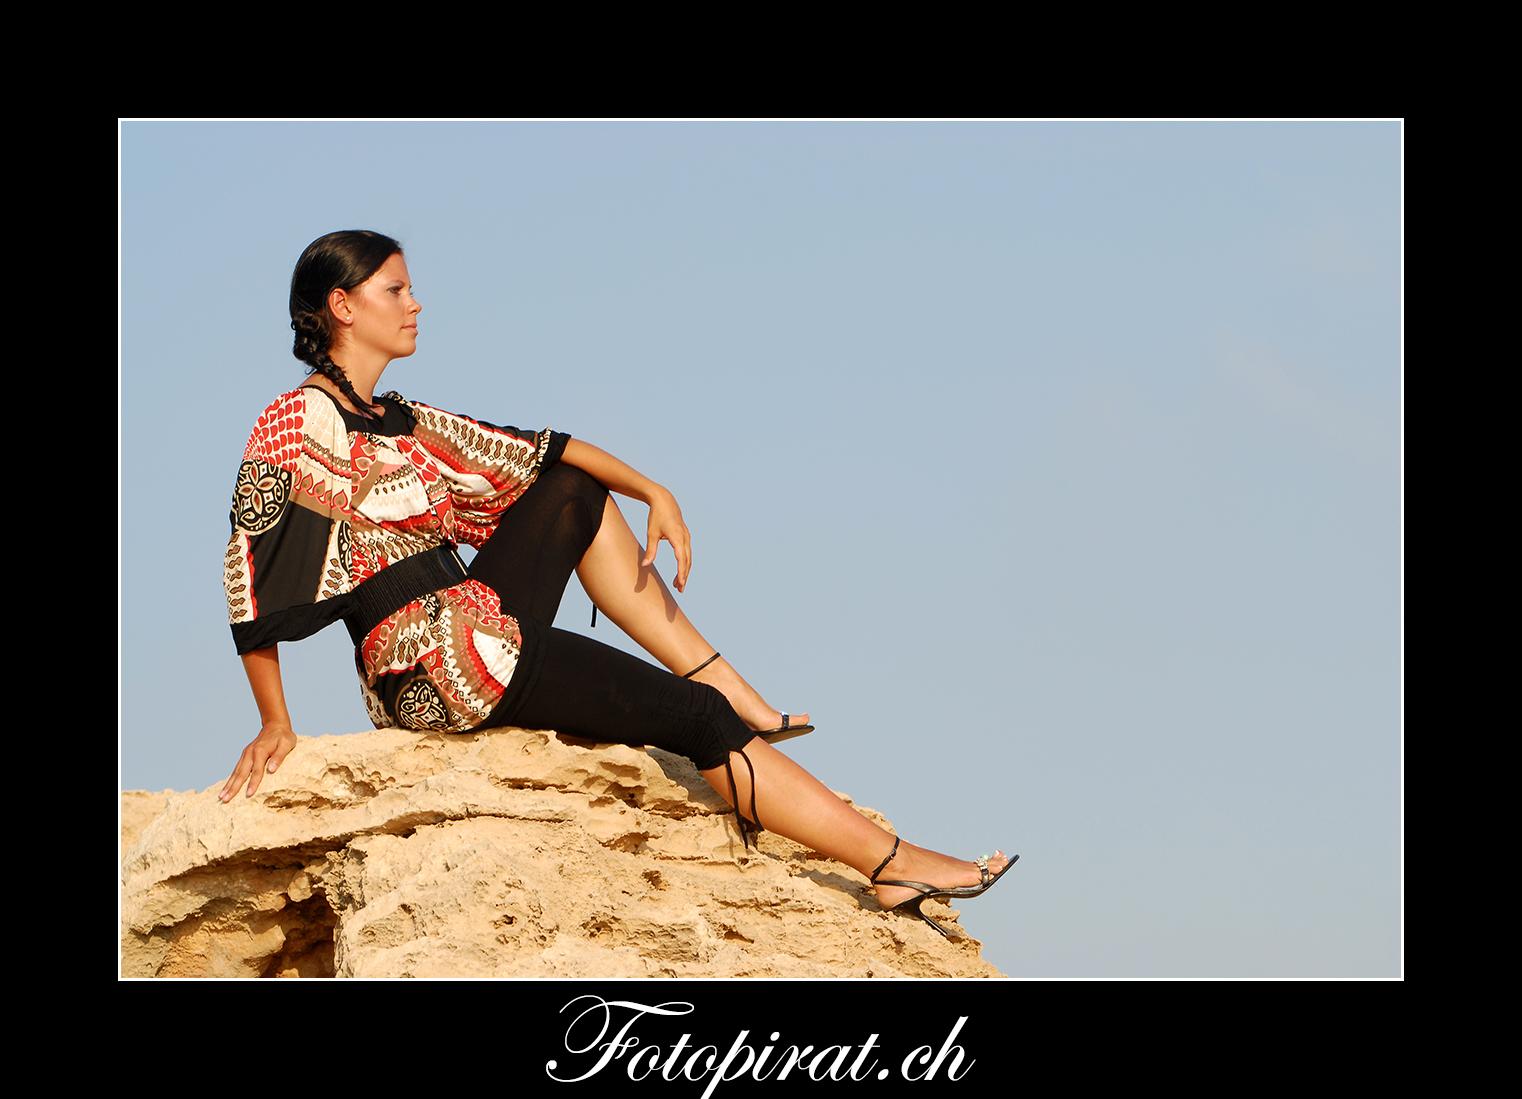 Fotoshooting, outdoor, Modelagentur, sexy Model, Sportmodel, Fitnessmodel, Ayia Napa